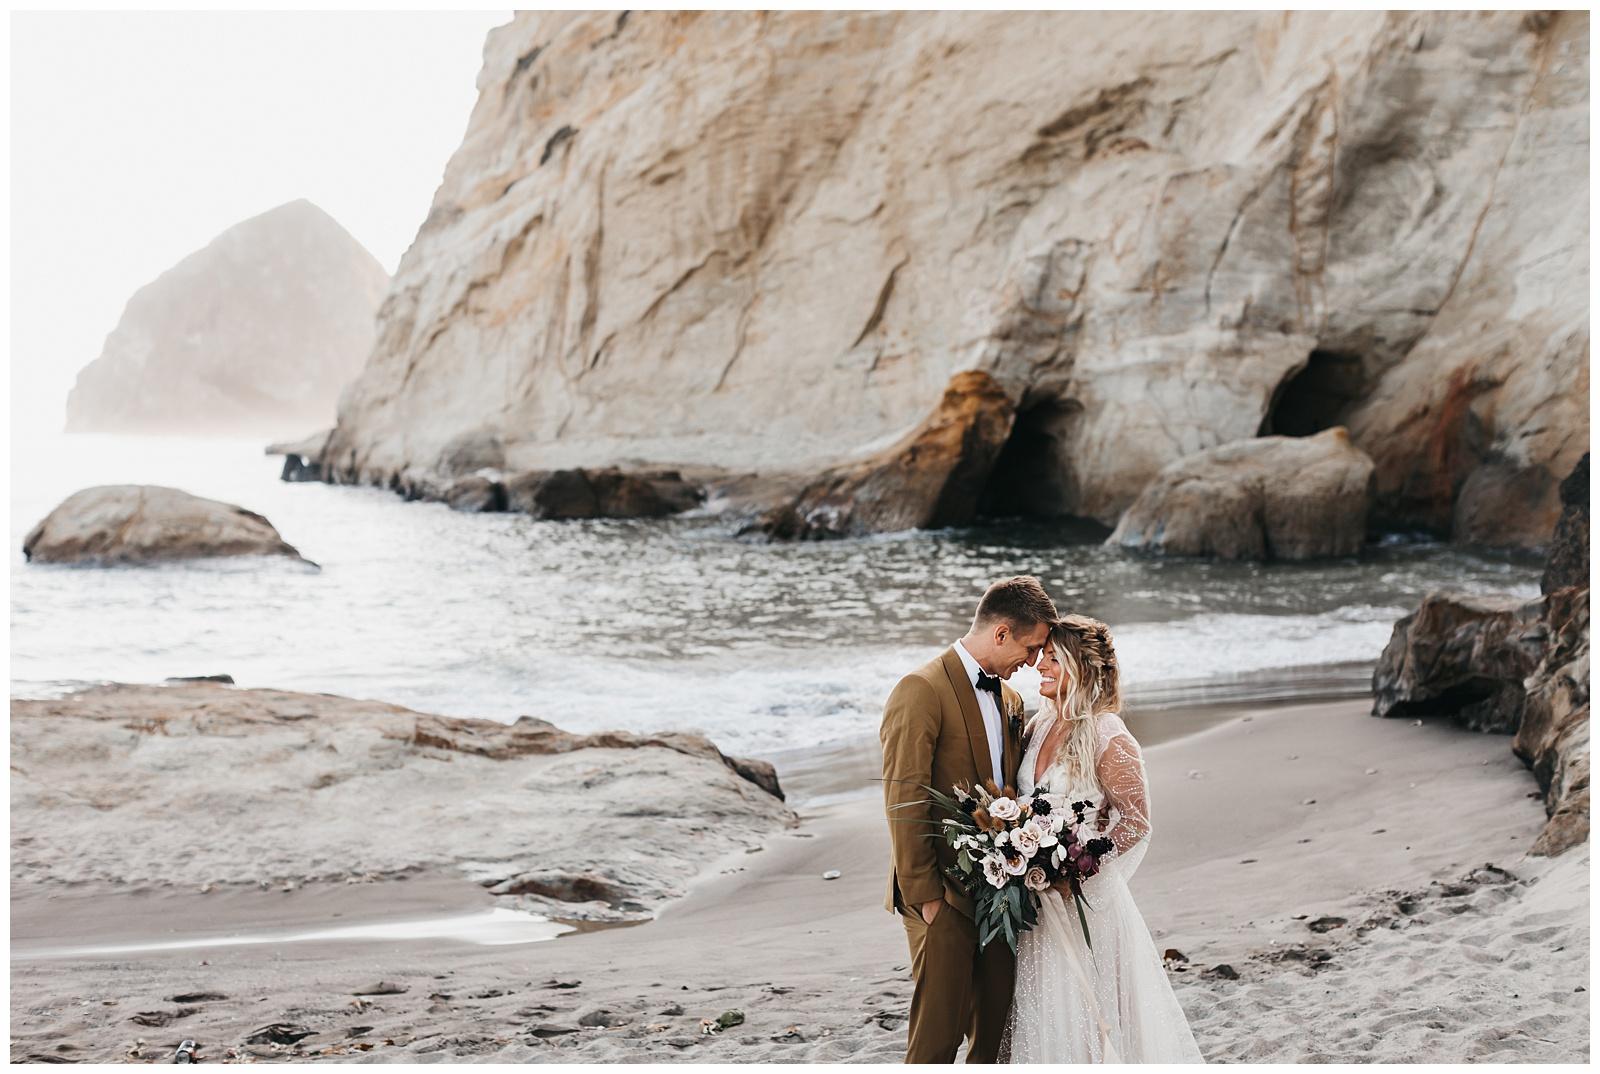 portland-wedding-photographer-pacific-city-elopement-photographer-anniezav_0023.jpg